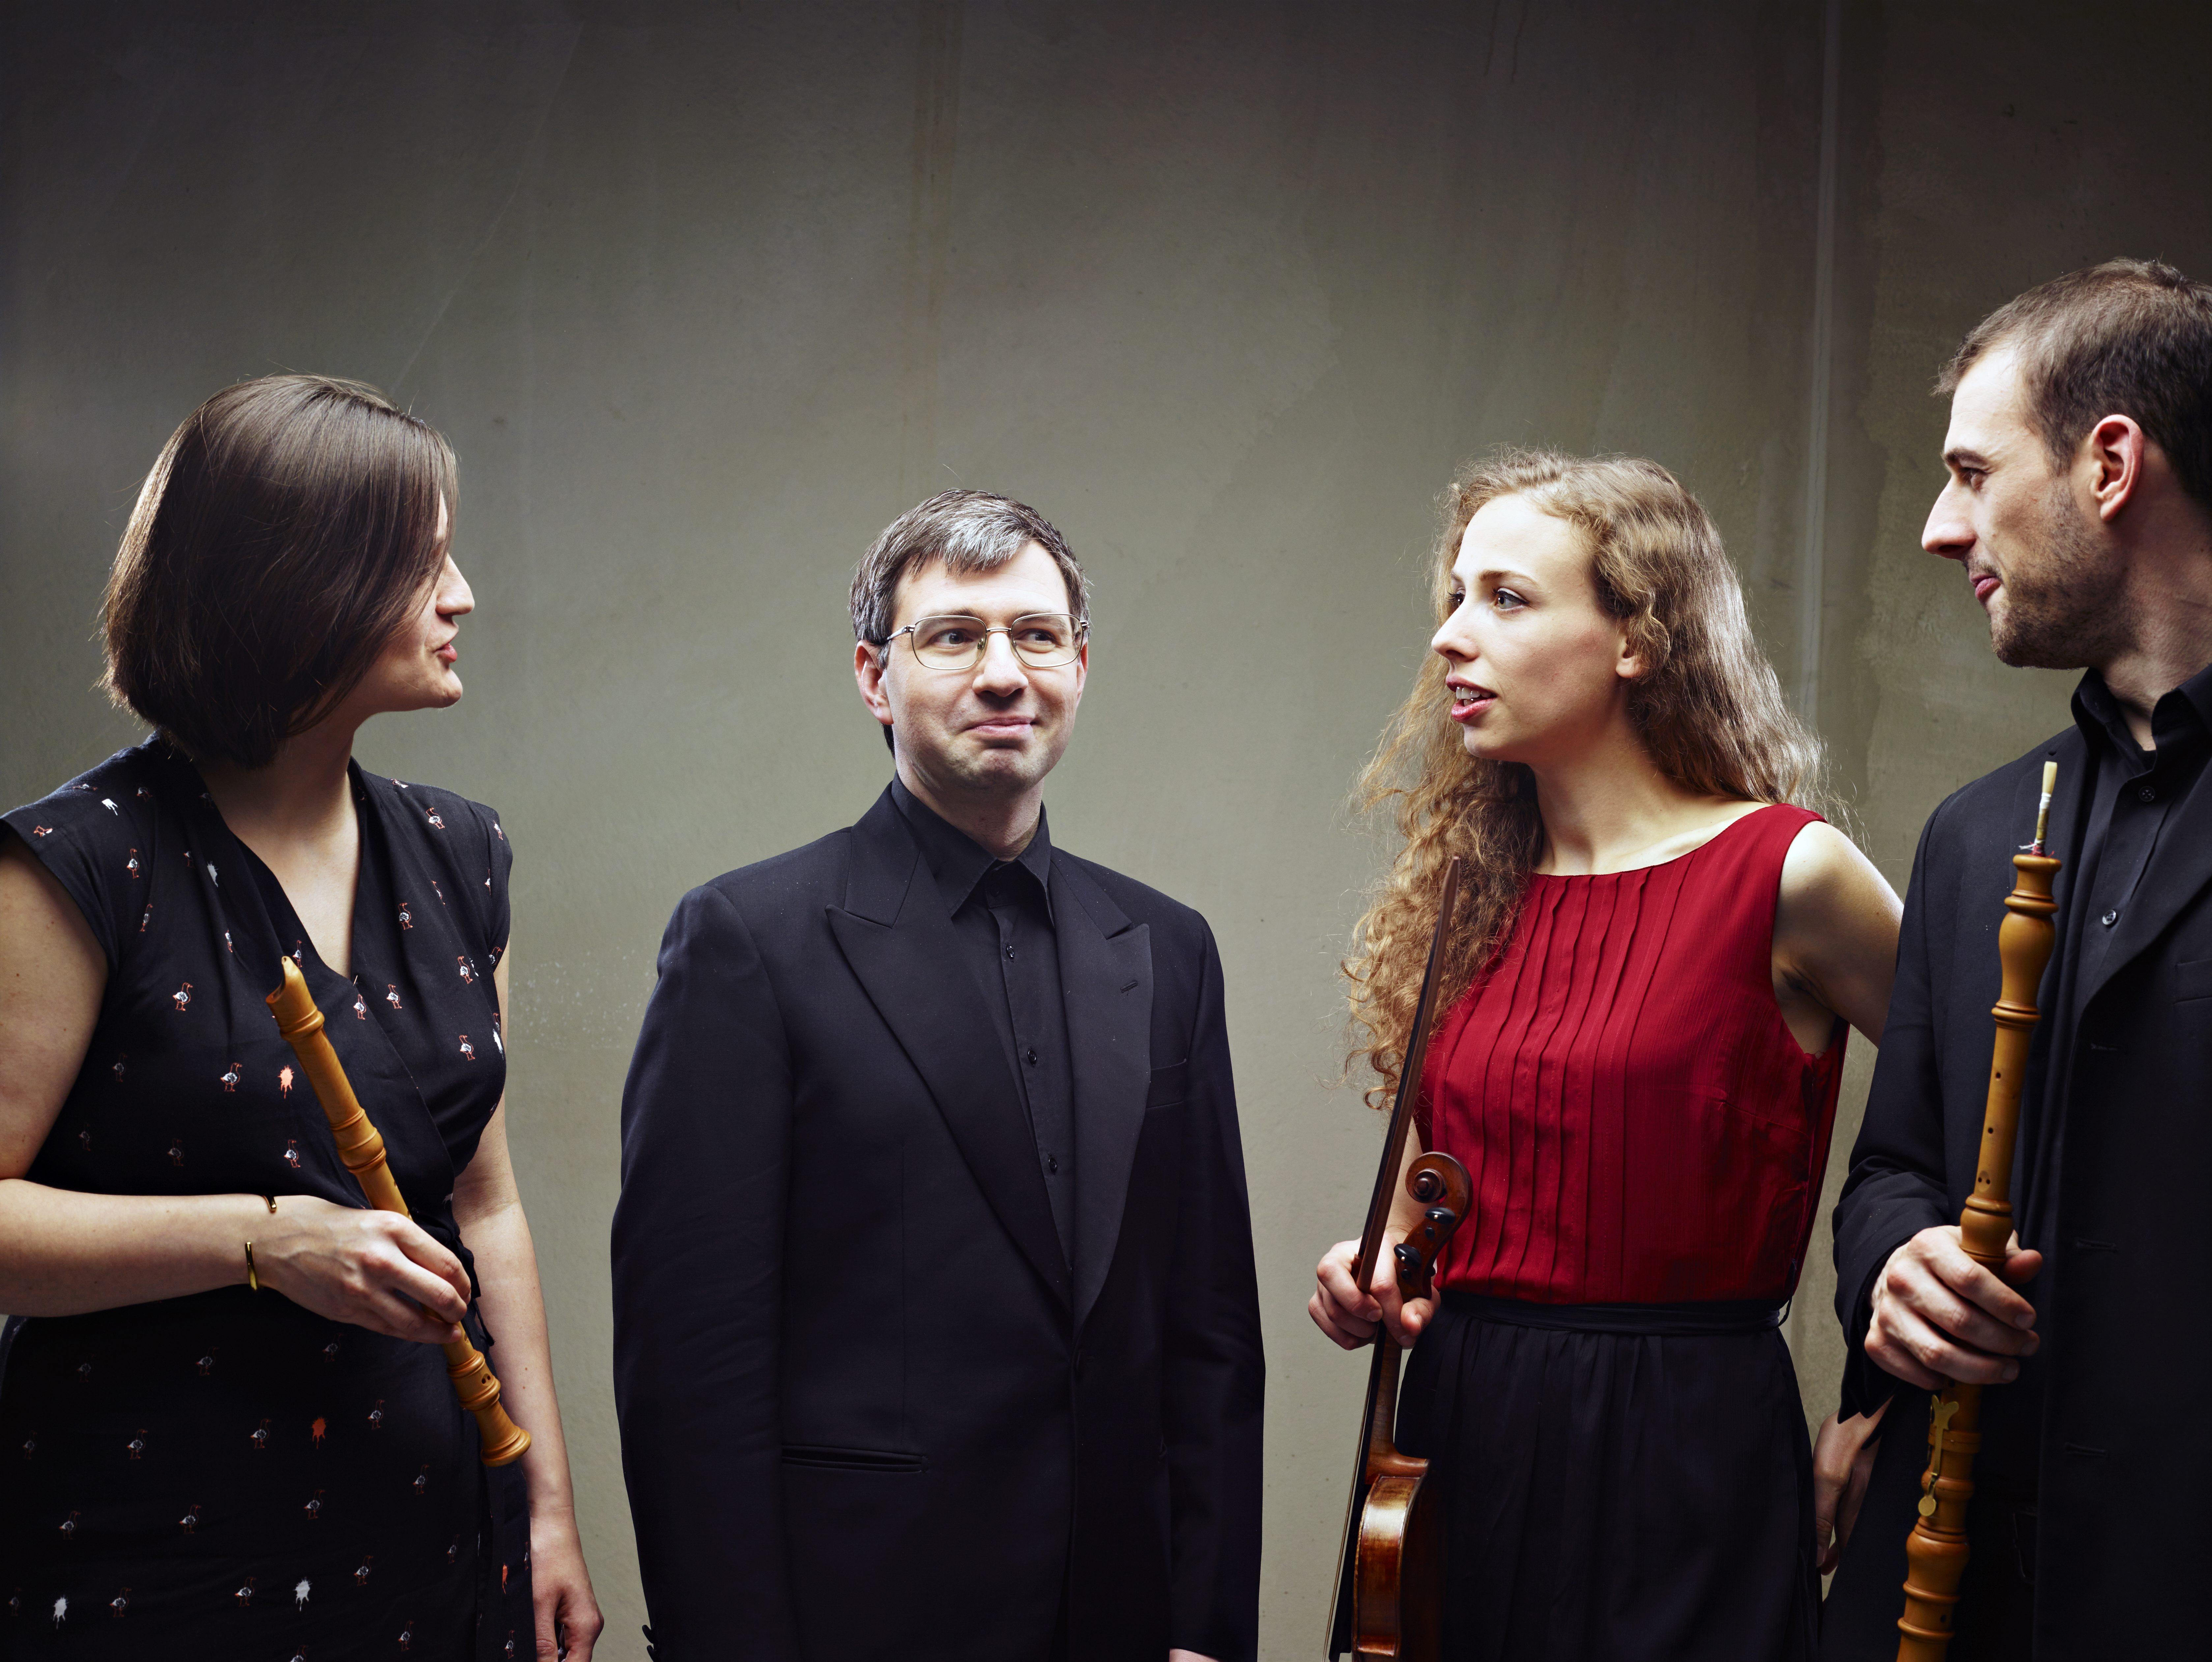 Ensemble Odyssee